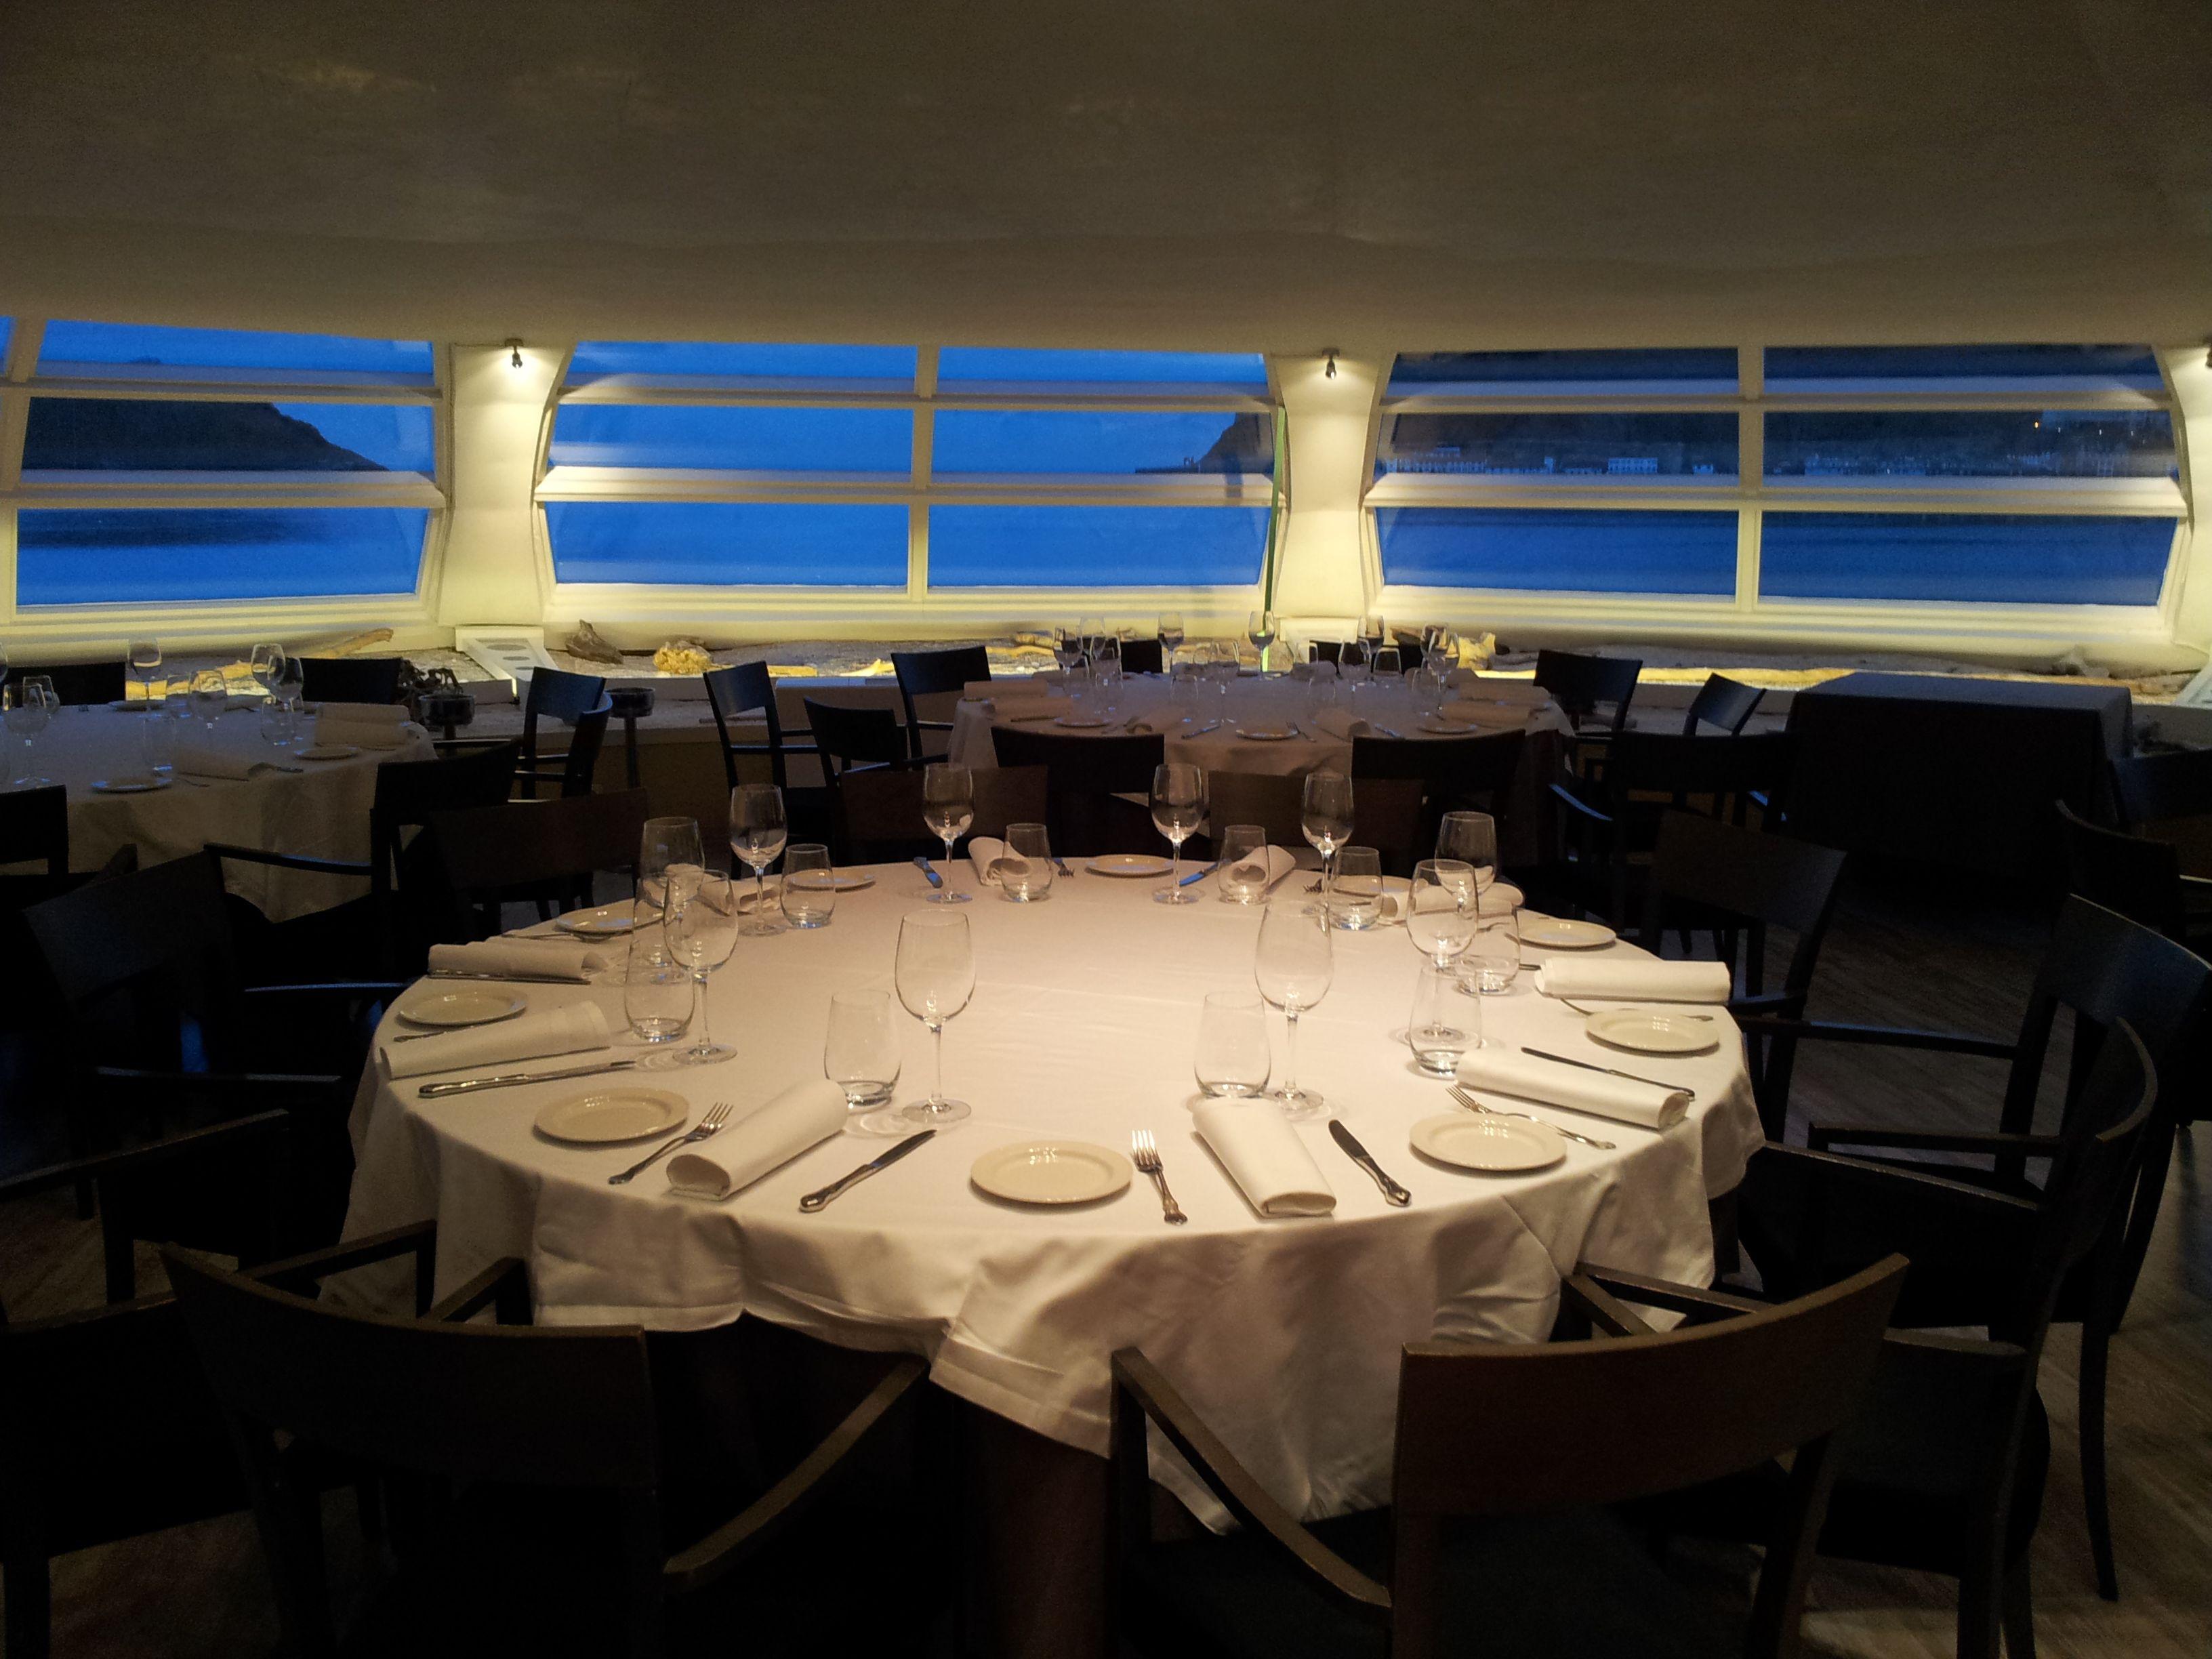 Jarra Largo Escudero  Nuestro restaurante a la noche #donostia, #restaurante, #sansebastian |  Restaurantes, Vistas, San sebastian